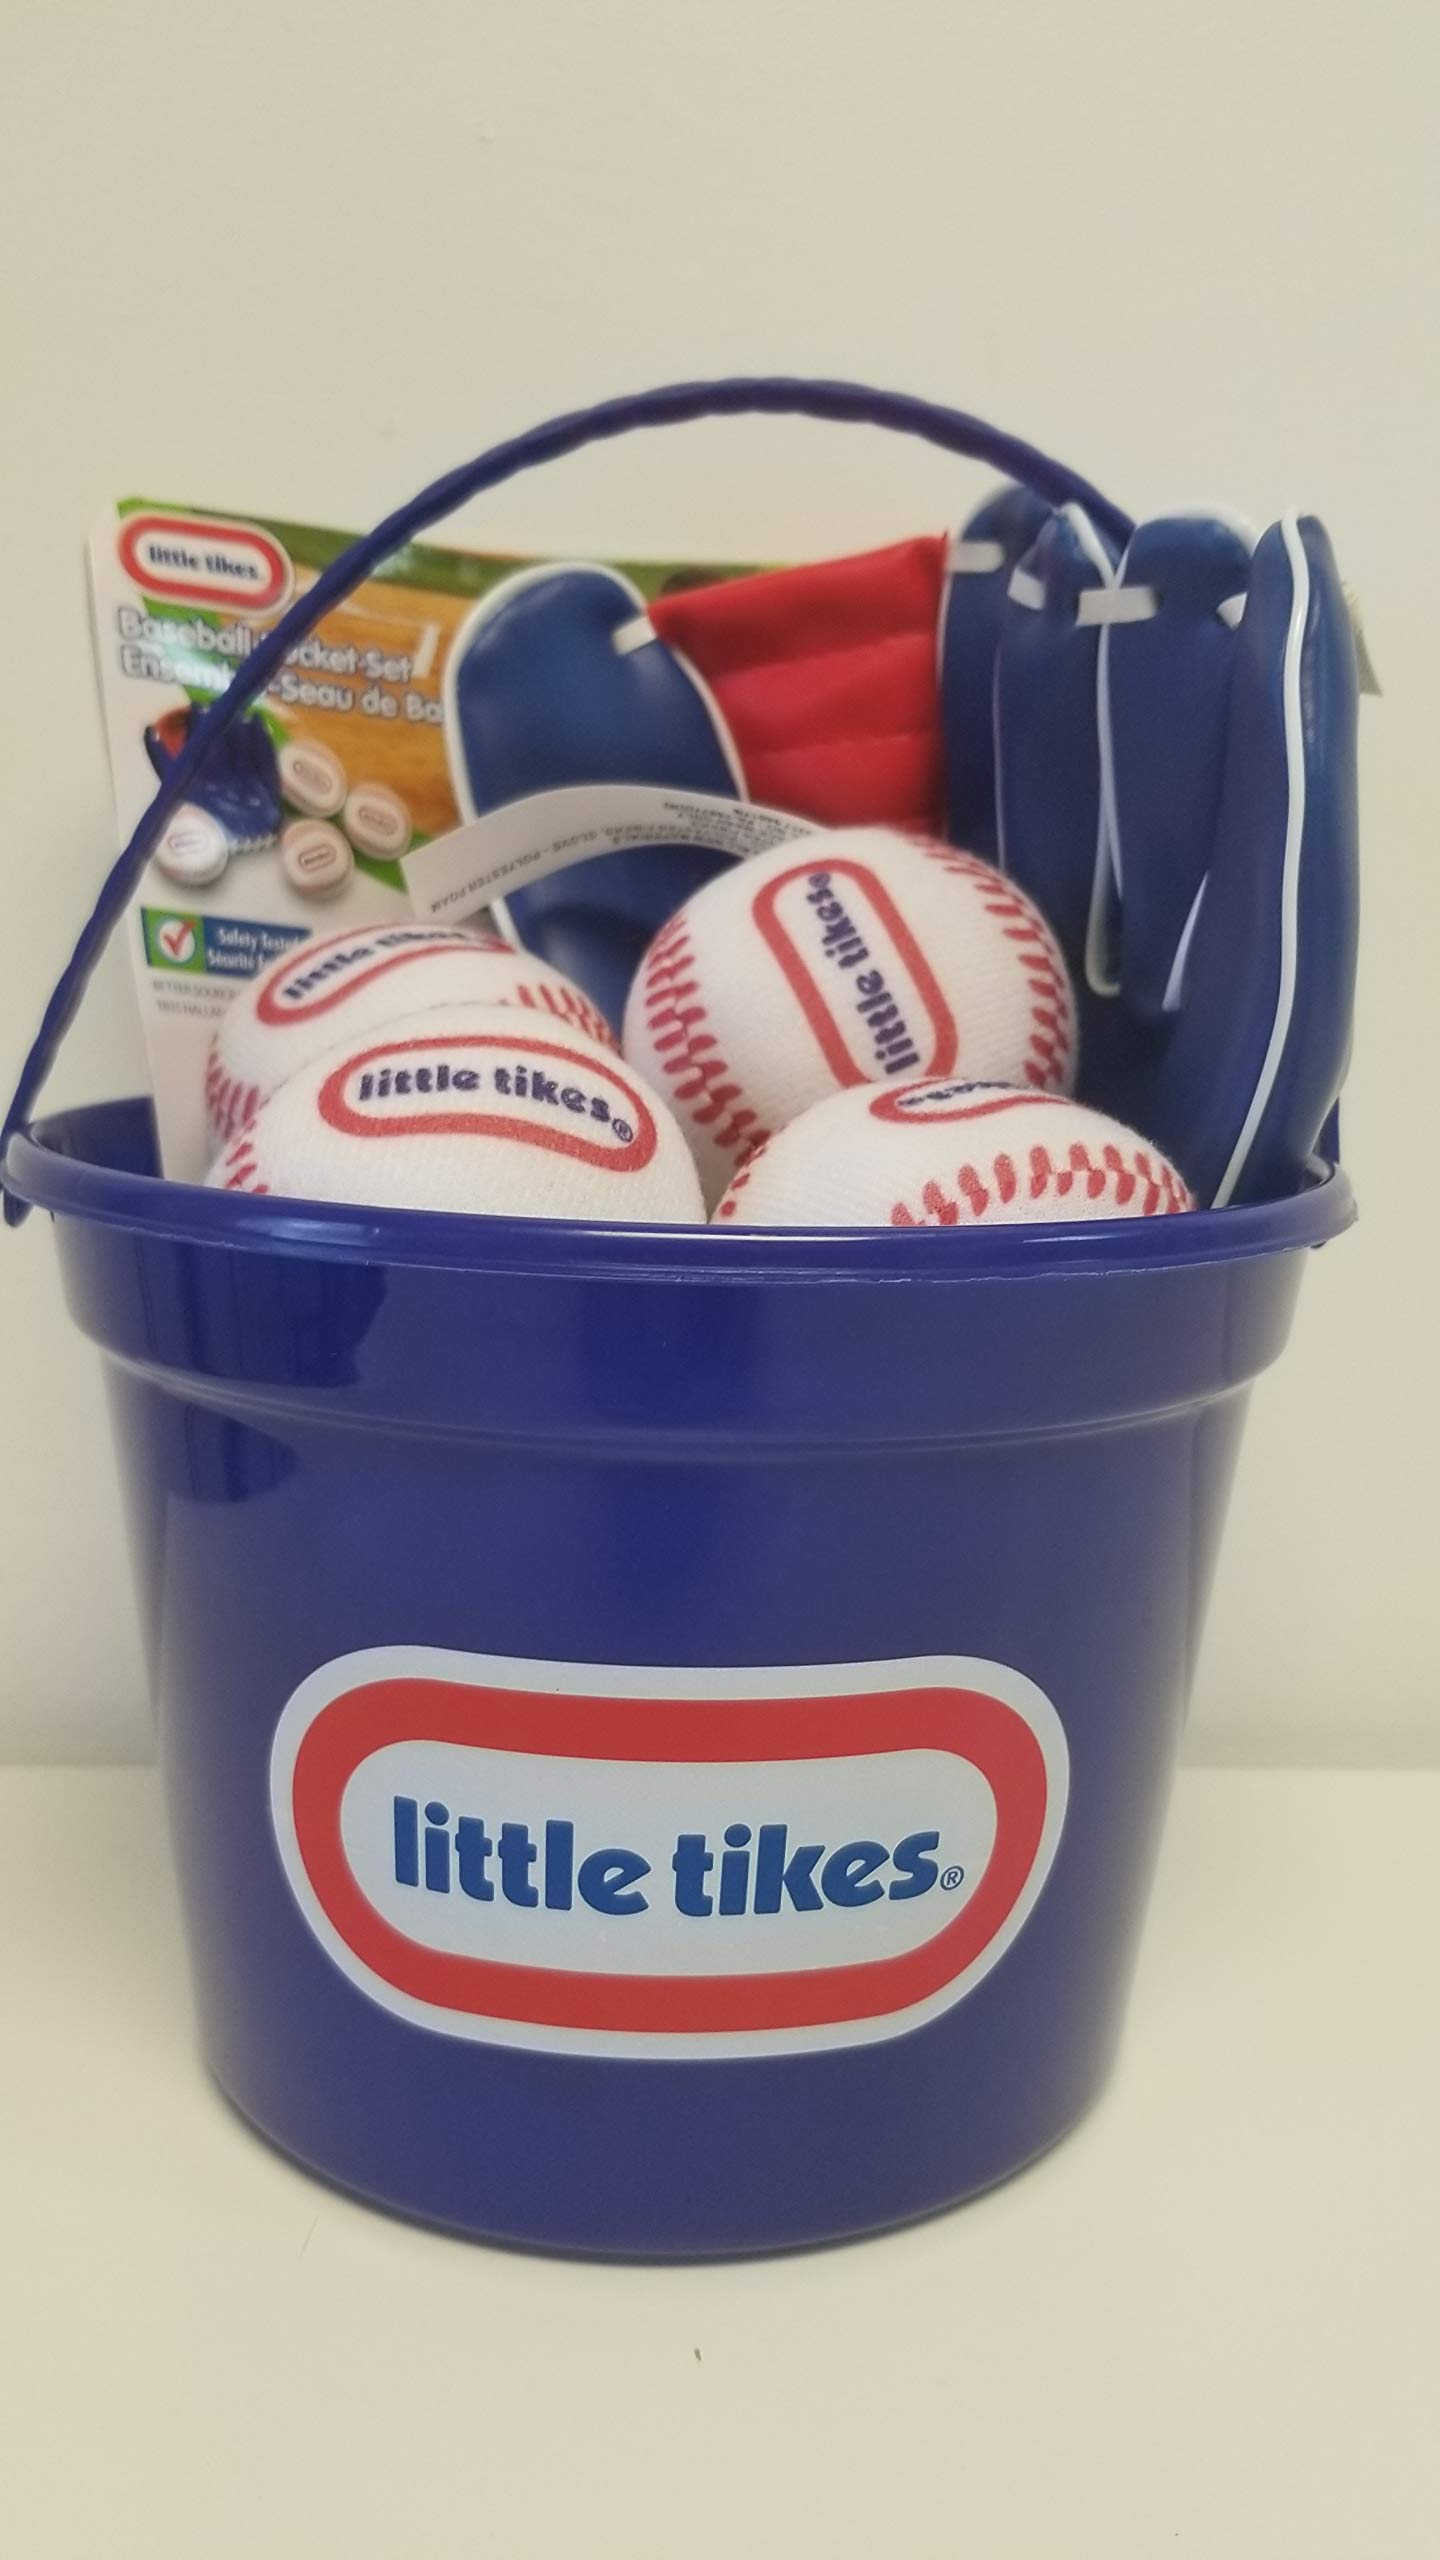 Little Tikes Ball and Mitt Training Set